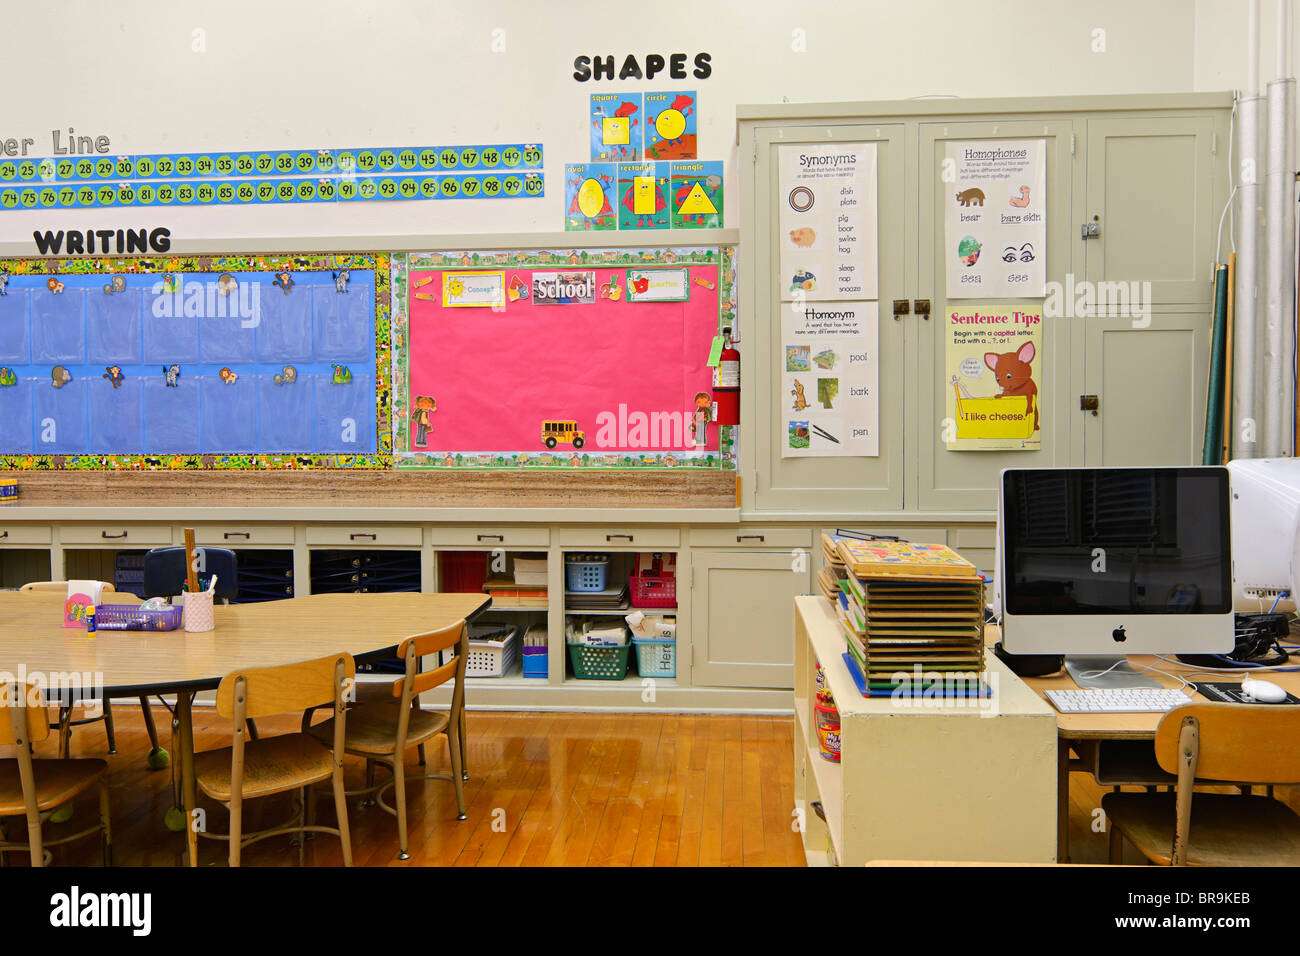 Kindergarten and First Grade classroom. - Stock Image